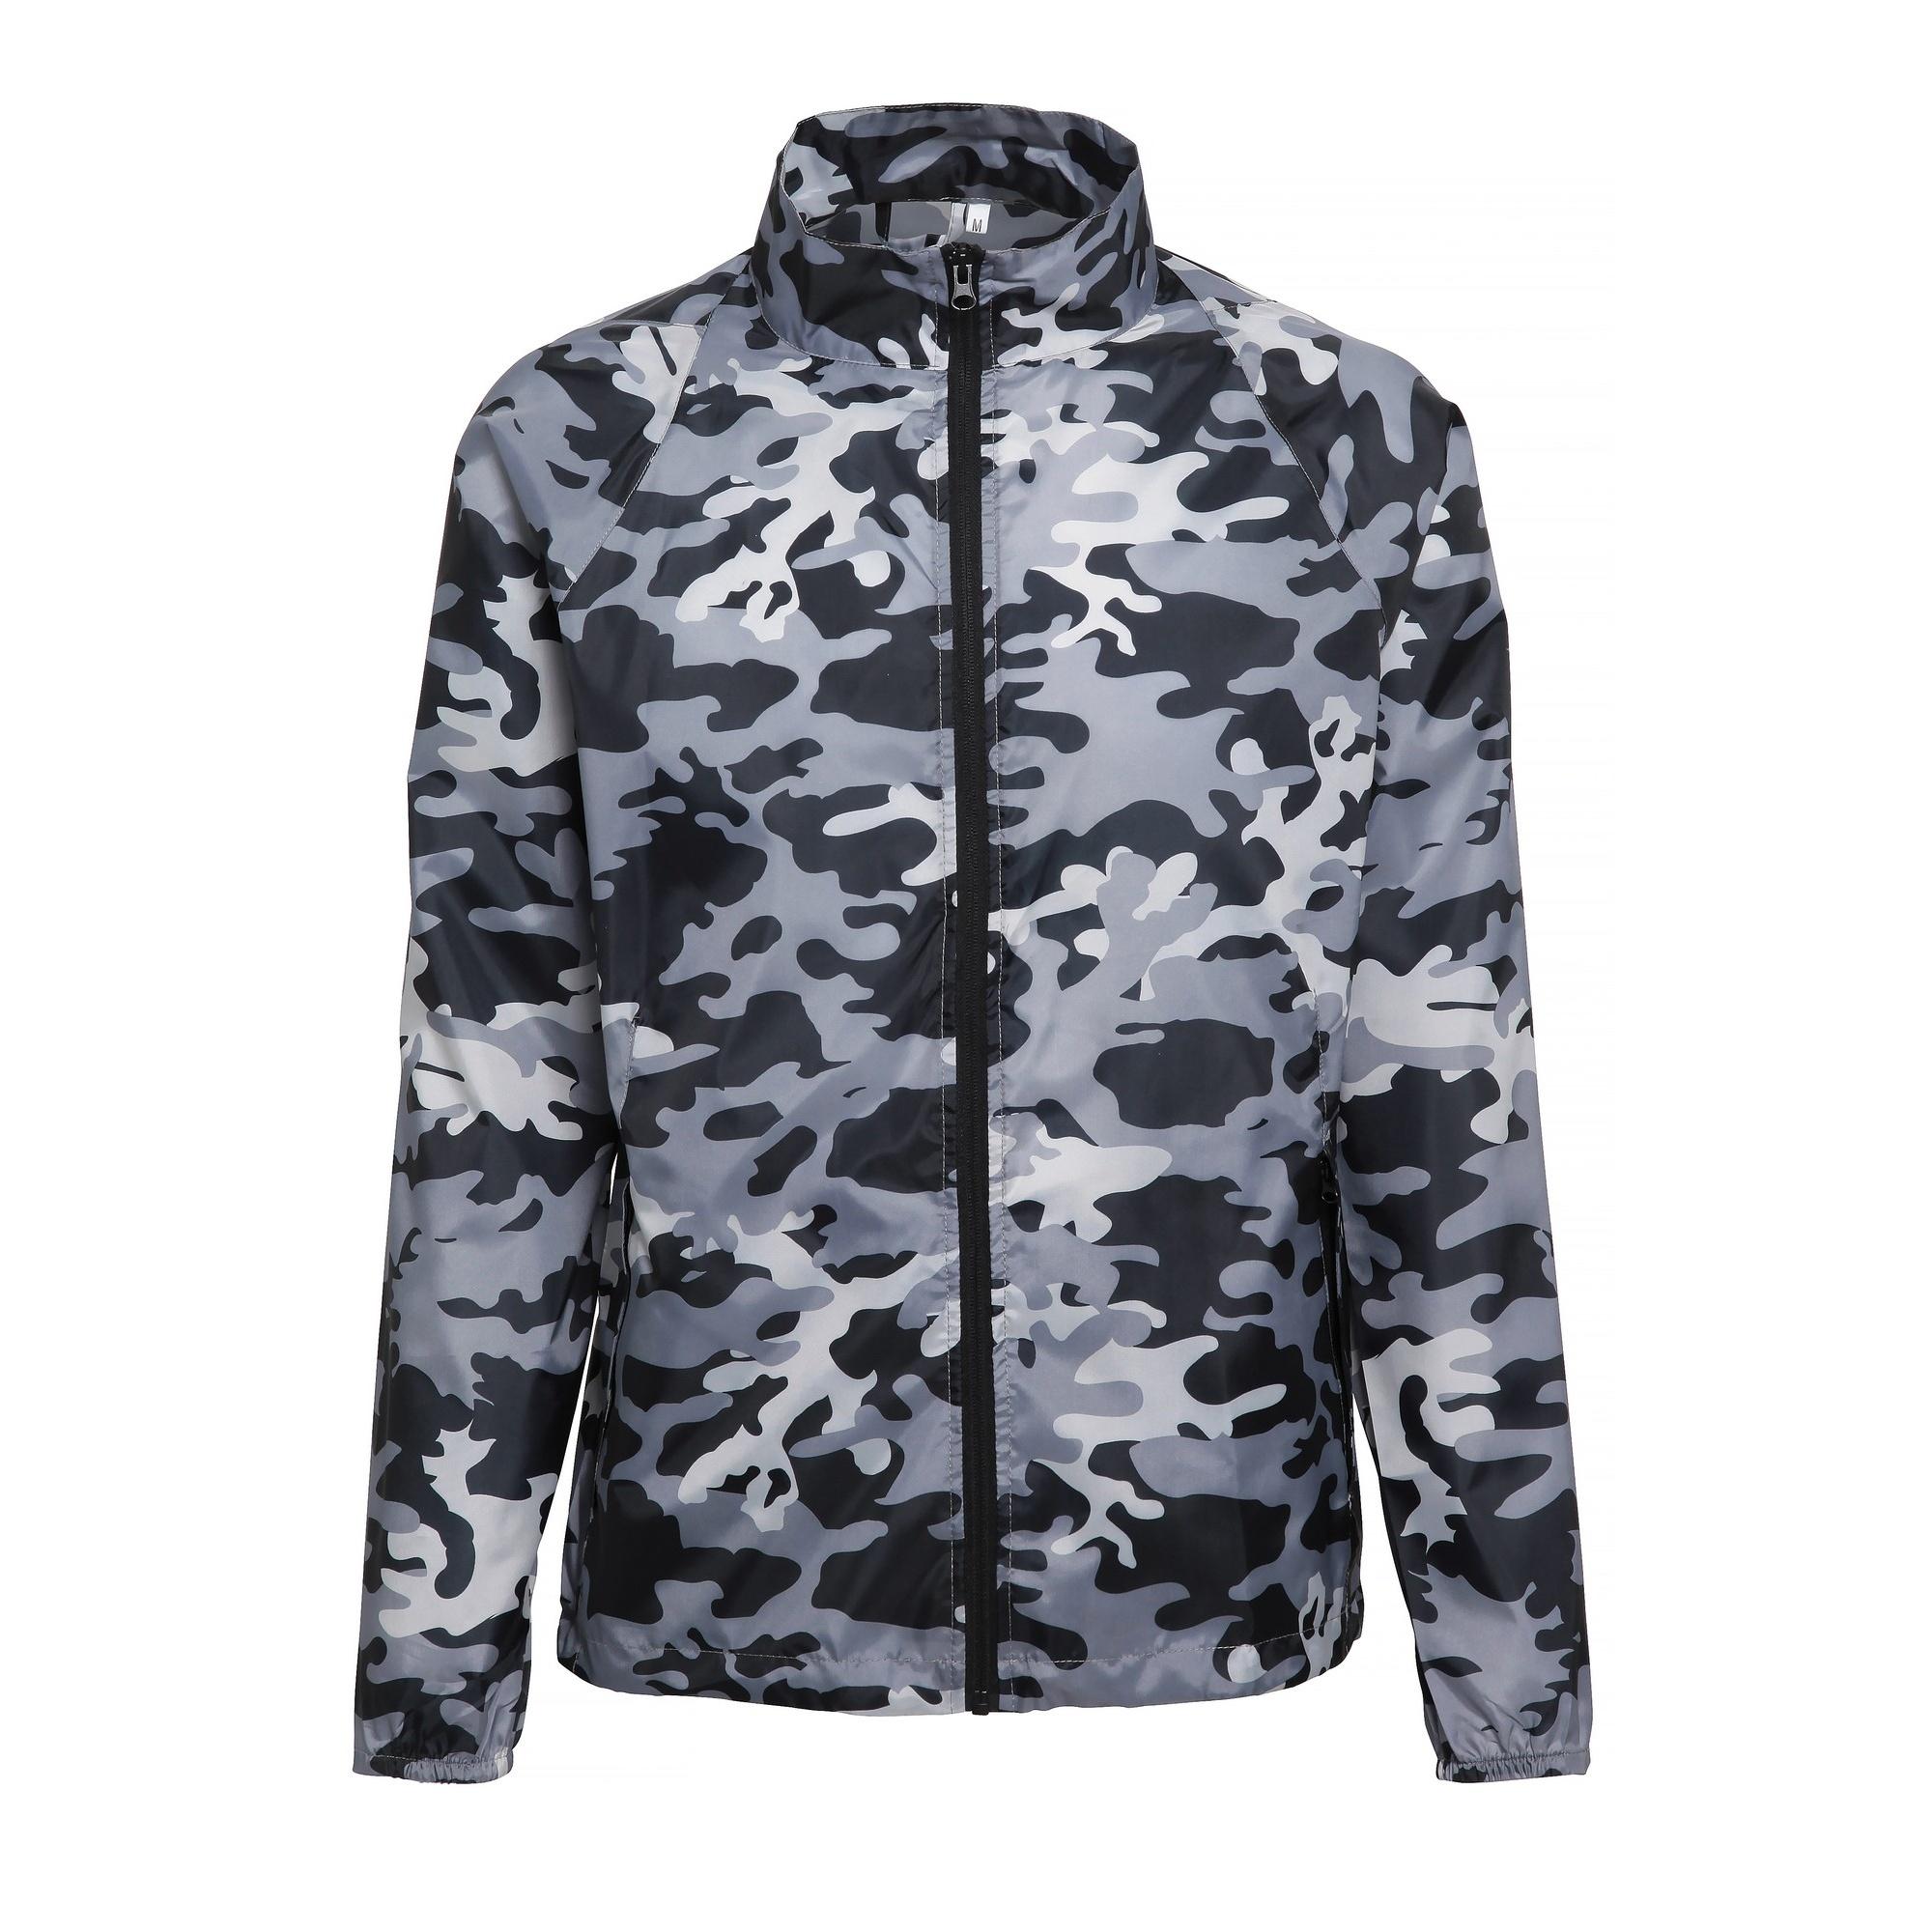 2786 Mens Contrast Lightweight Windcheater Shower Proof Jacket (Pack of 2) (M) (Bold Camo Grey)